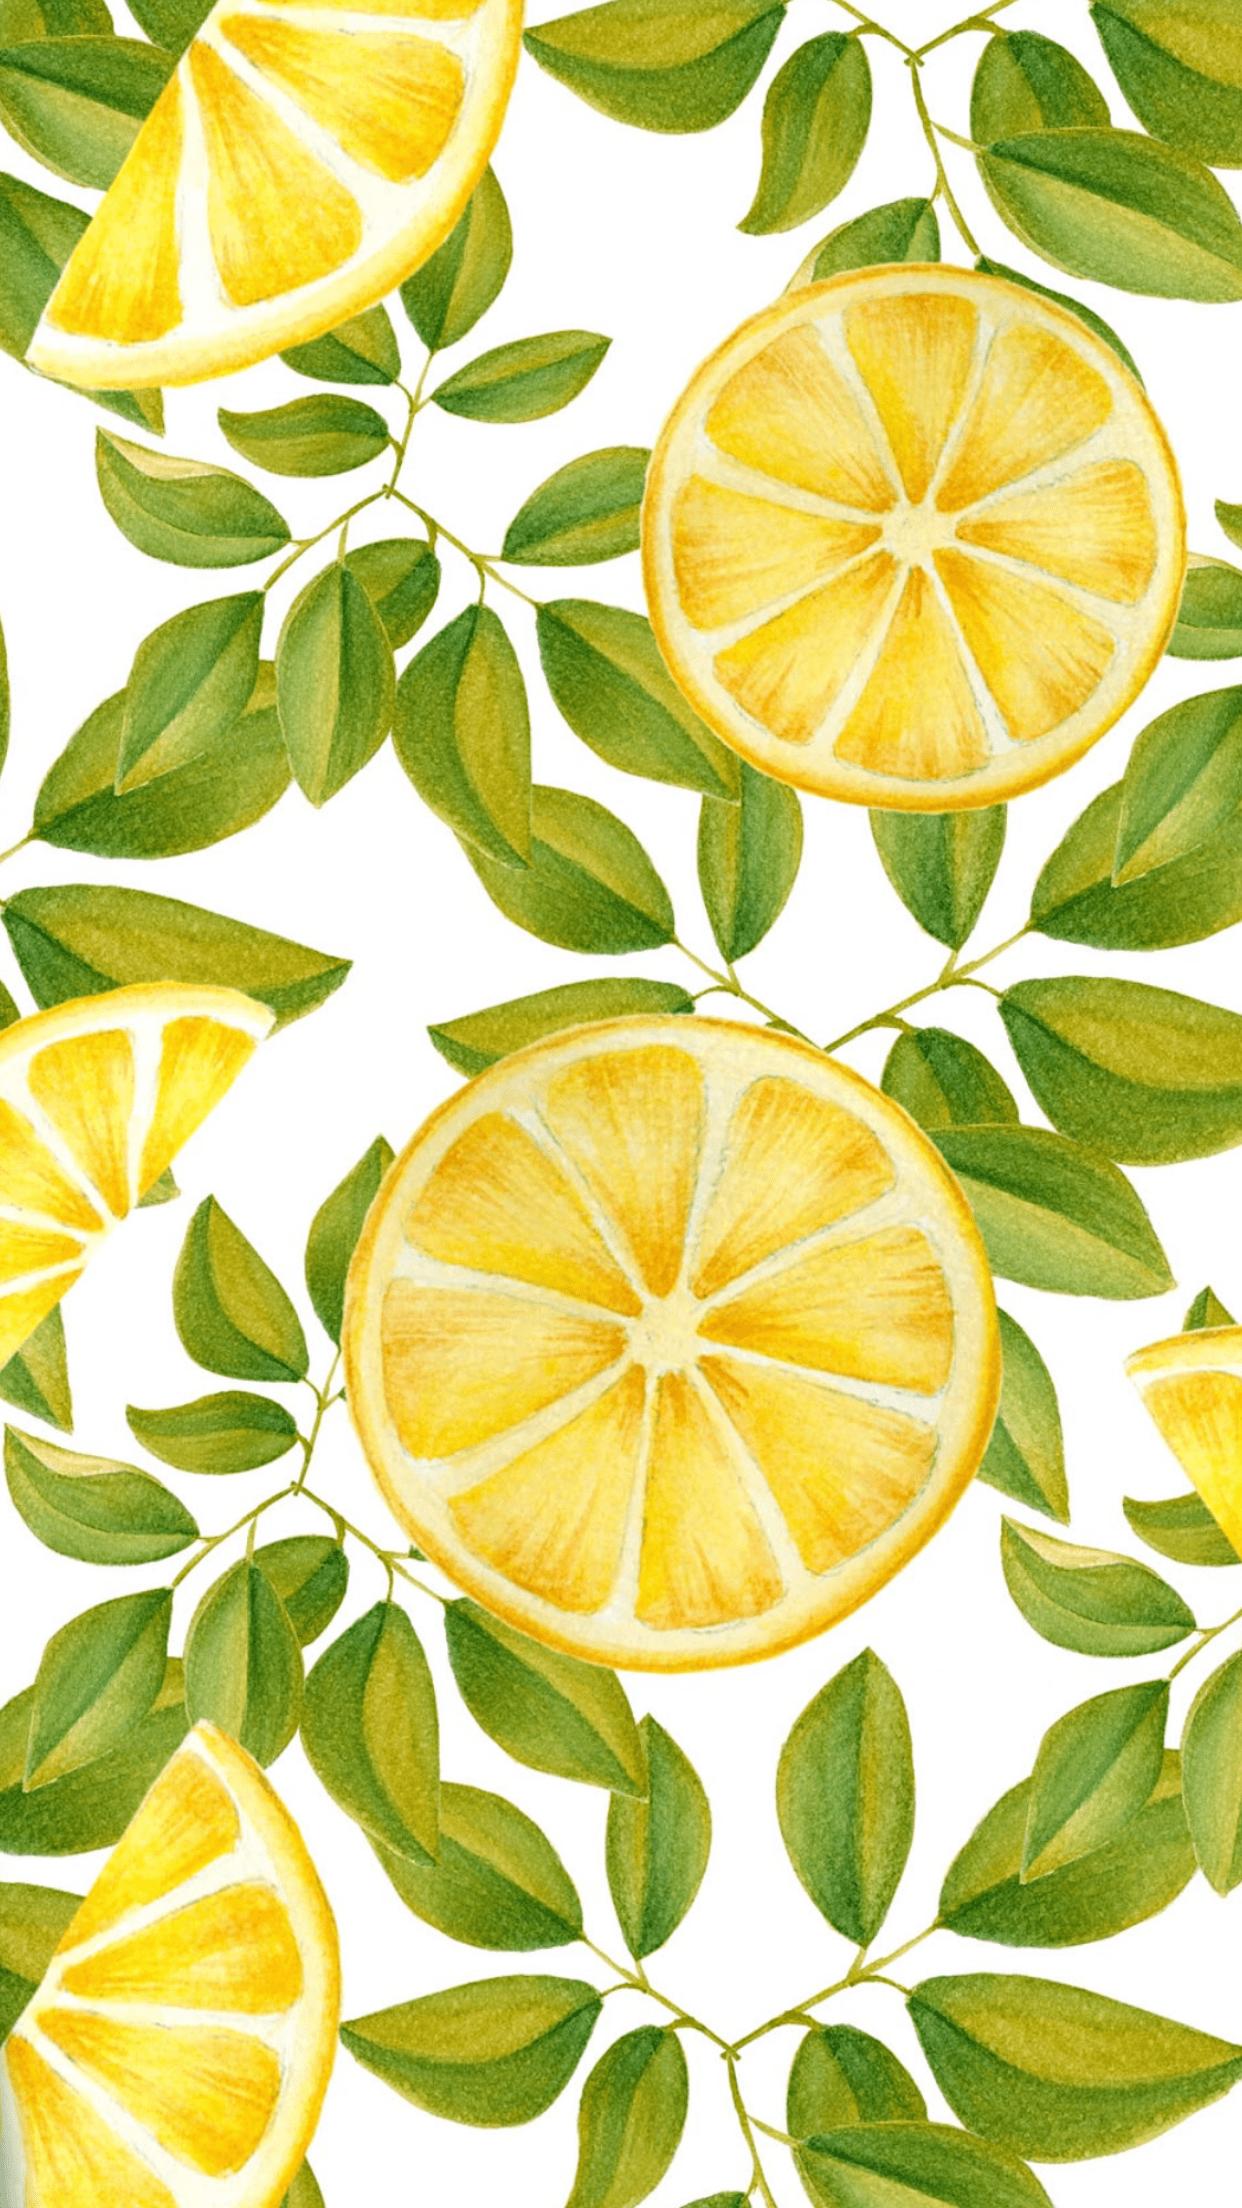 Aesthetic Lemon Wallpapers Top Free Aesthetic Lemon Backgrounds